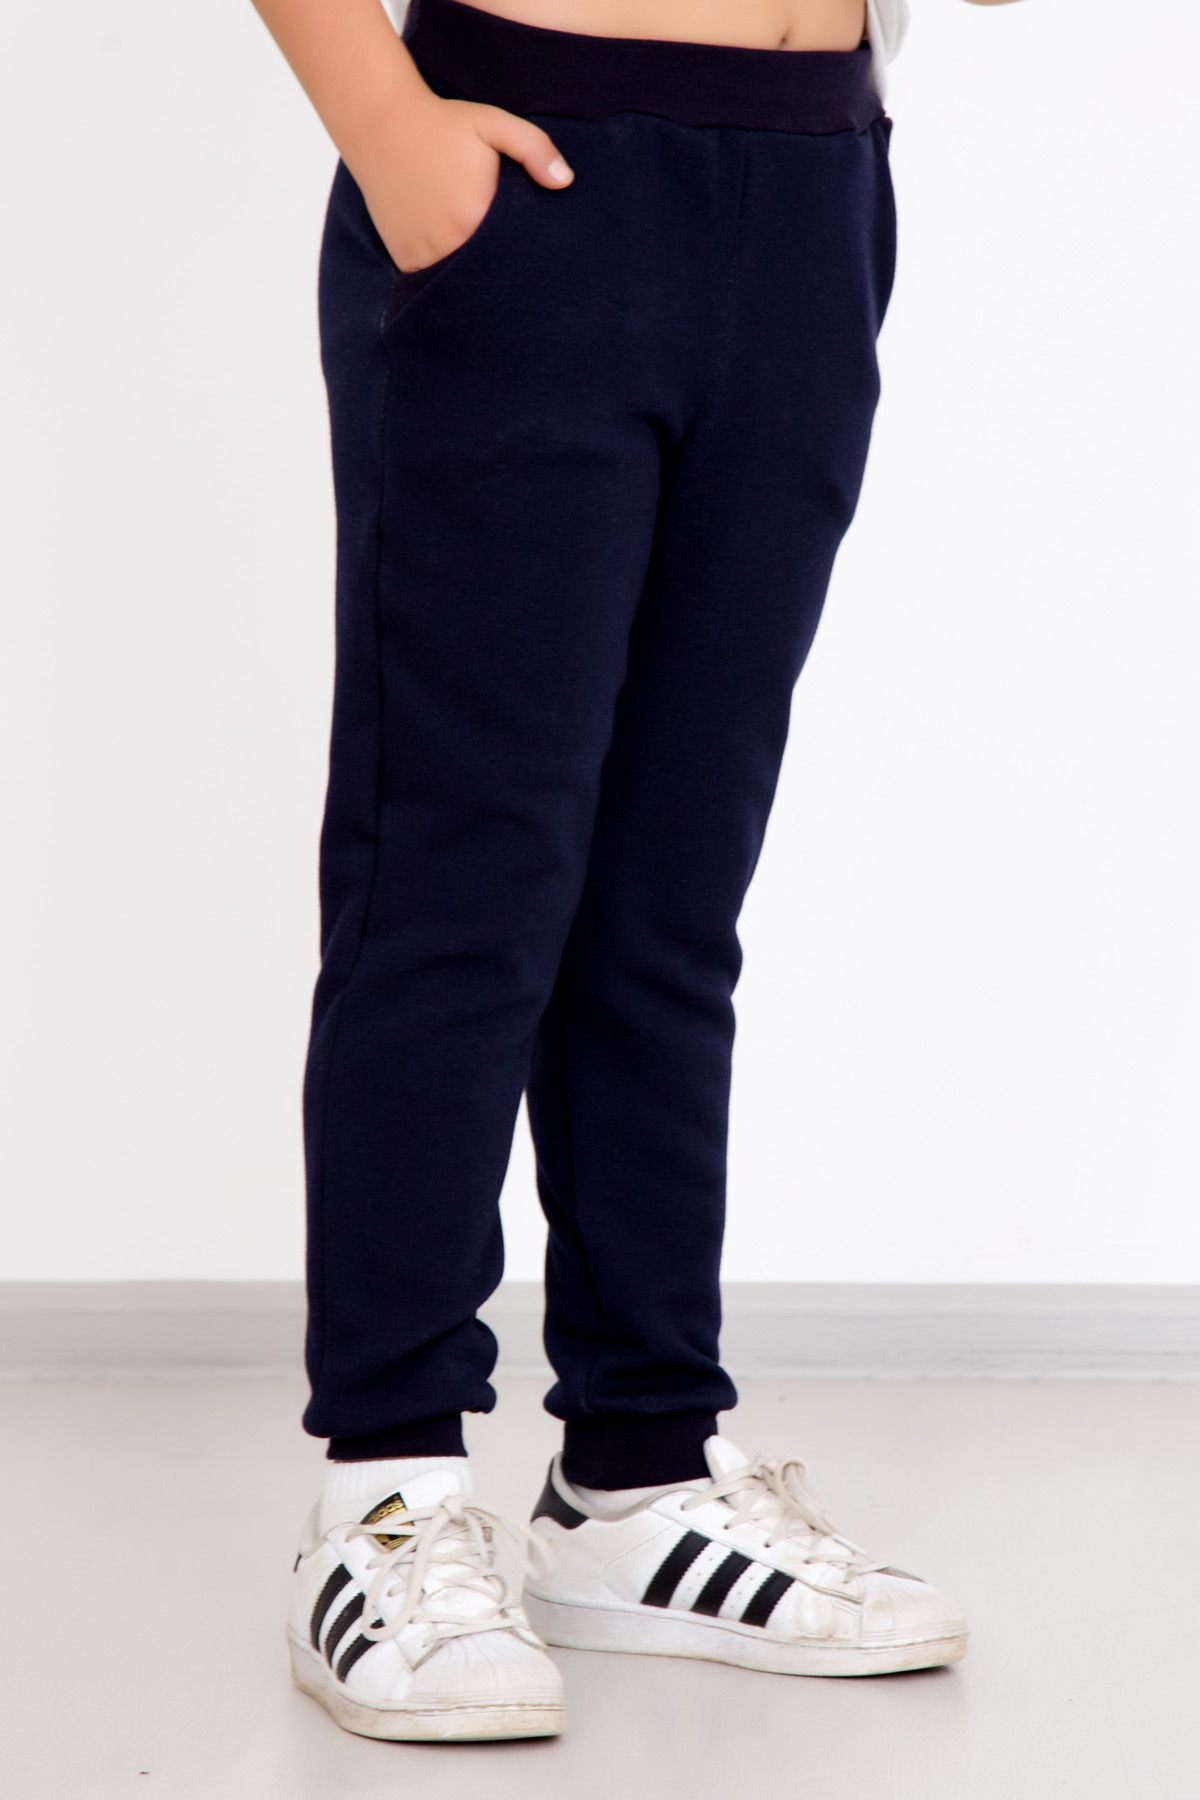 Дет. брюки Спринт р. 28 дет шорты жан р 28